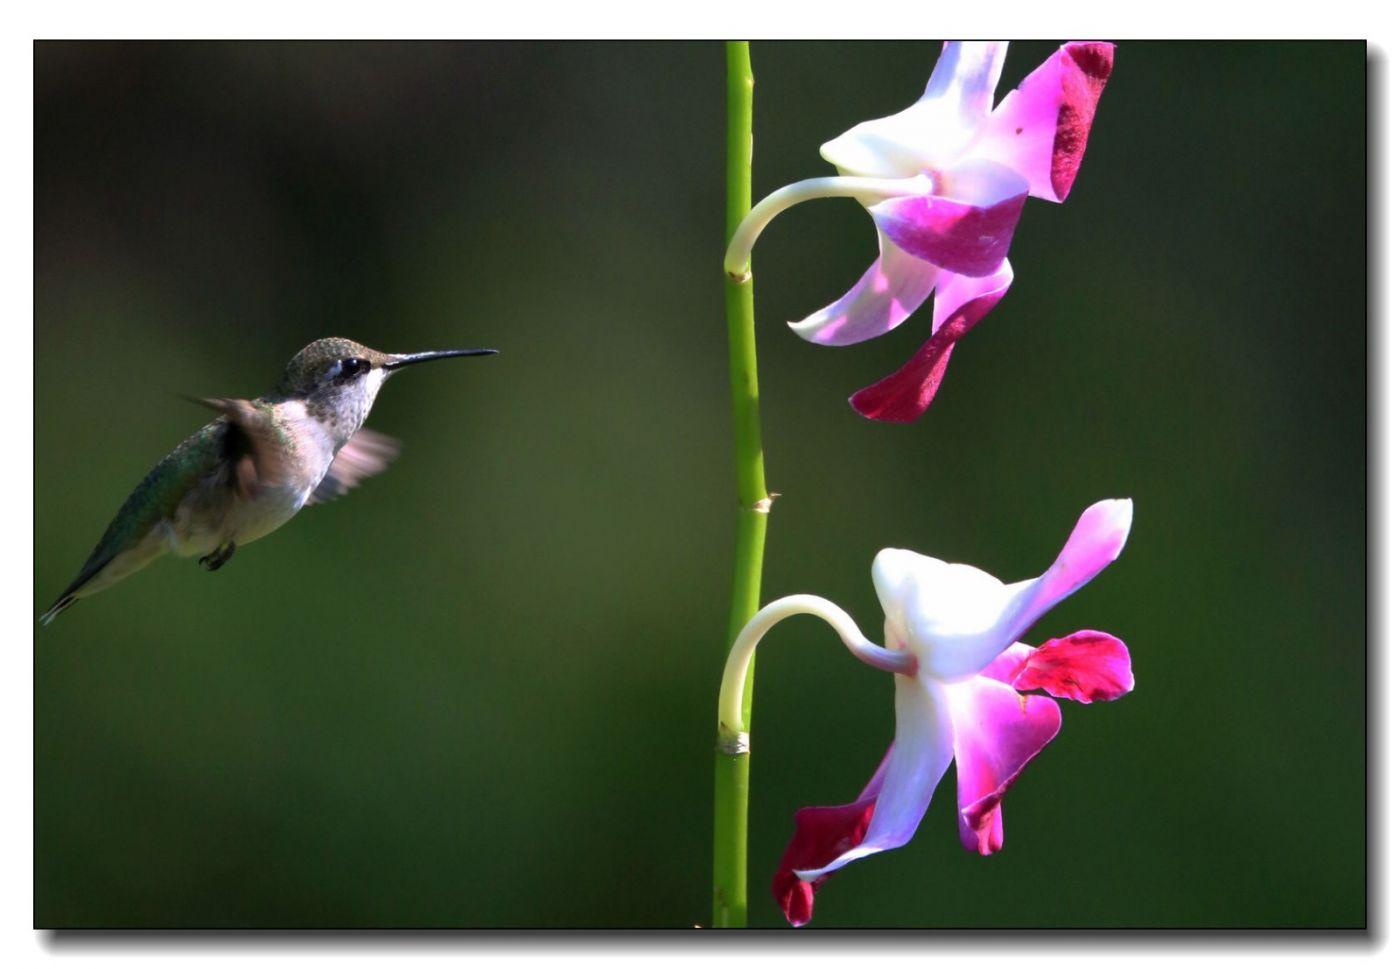 蜂鸟组图(五)_图1-18